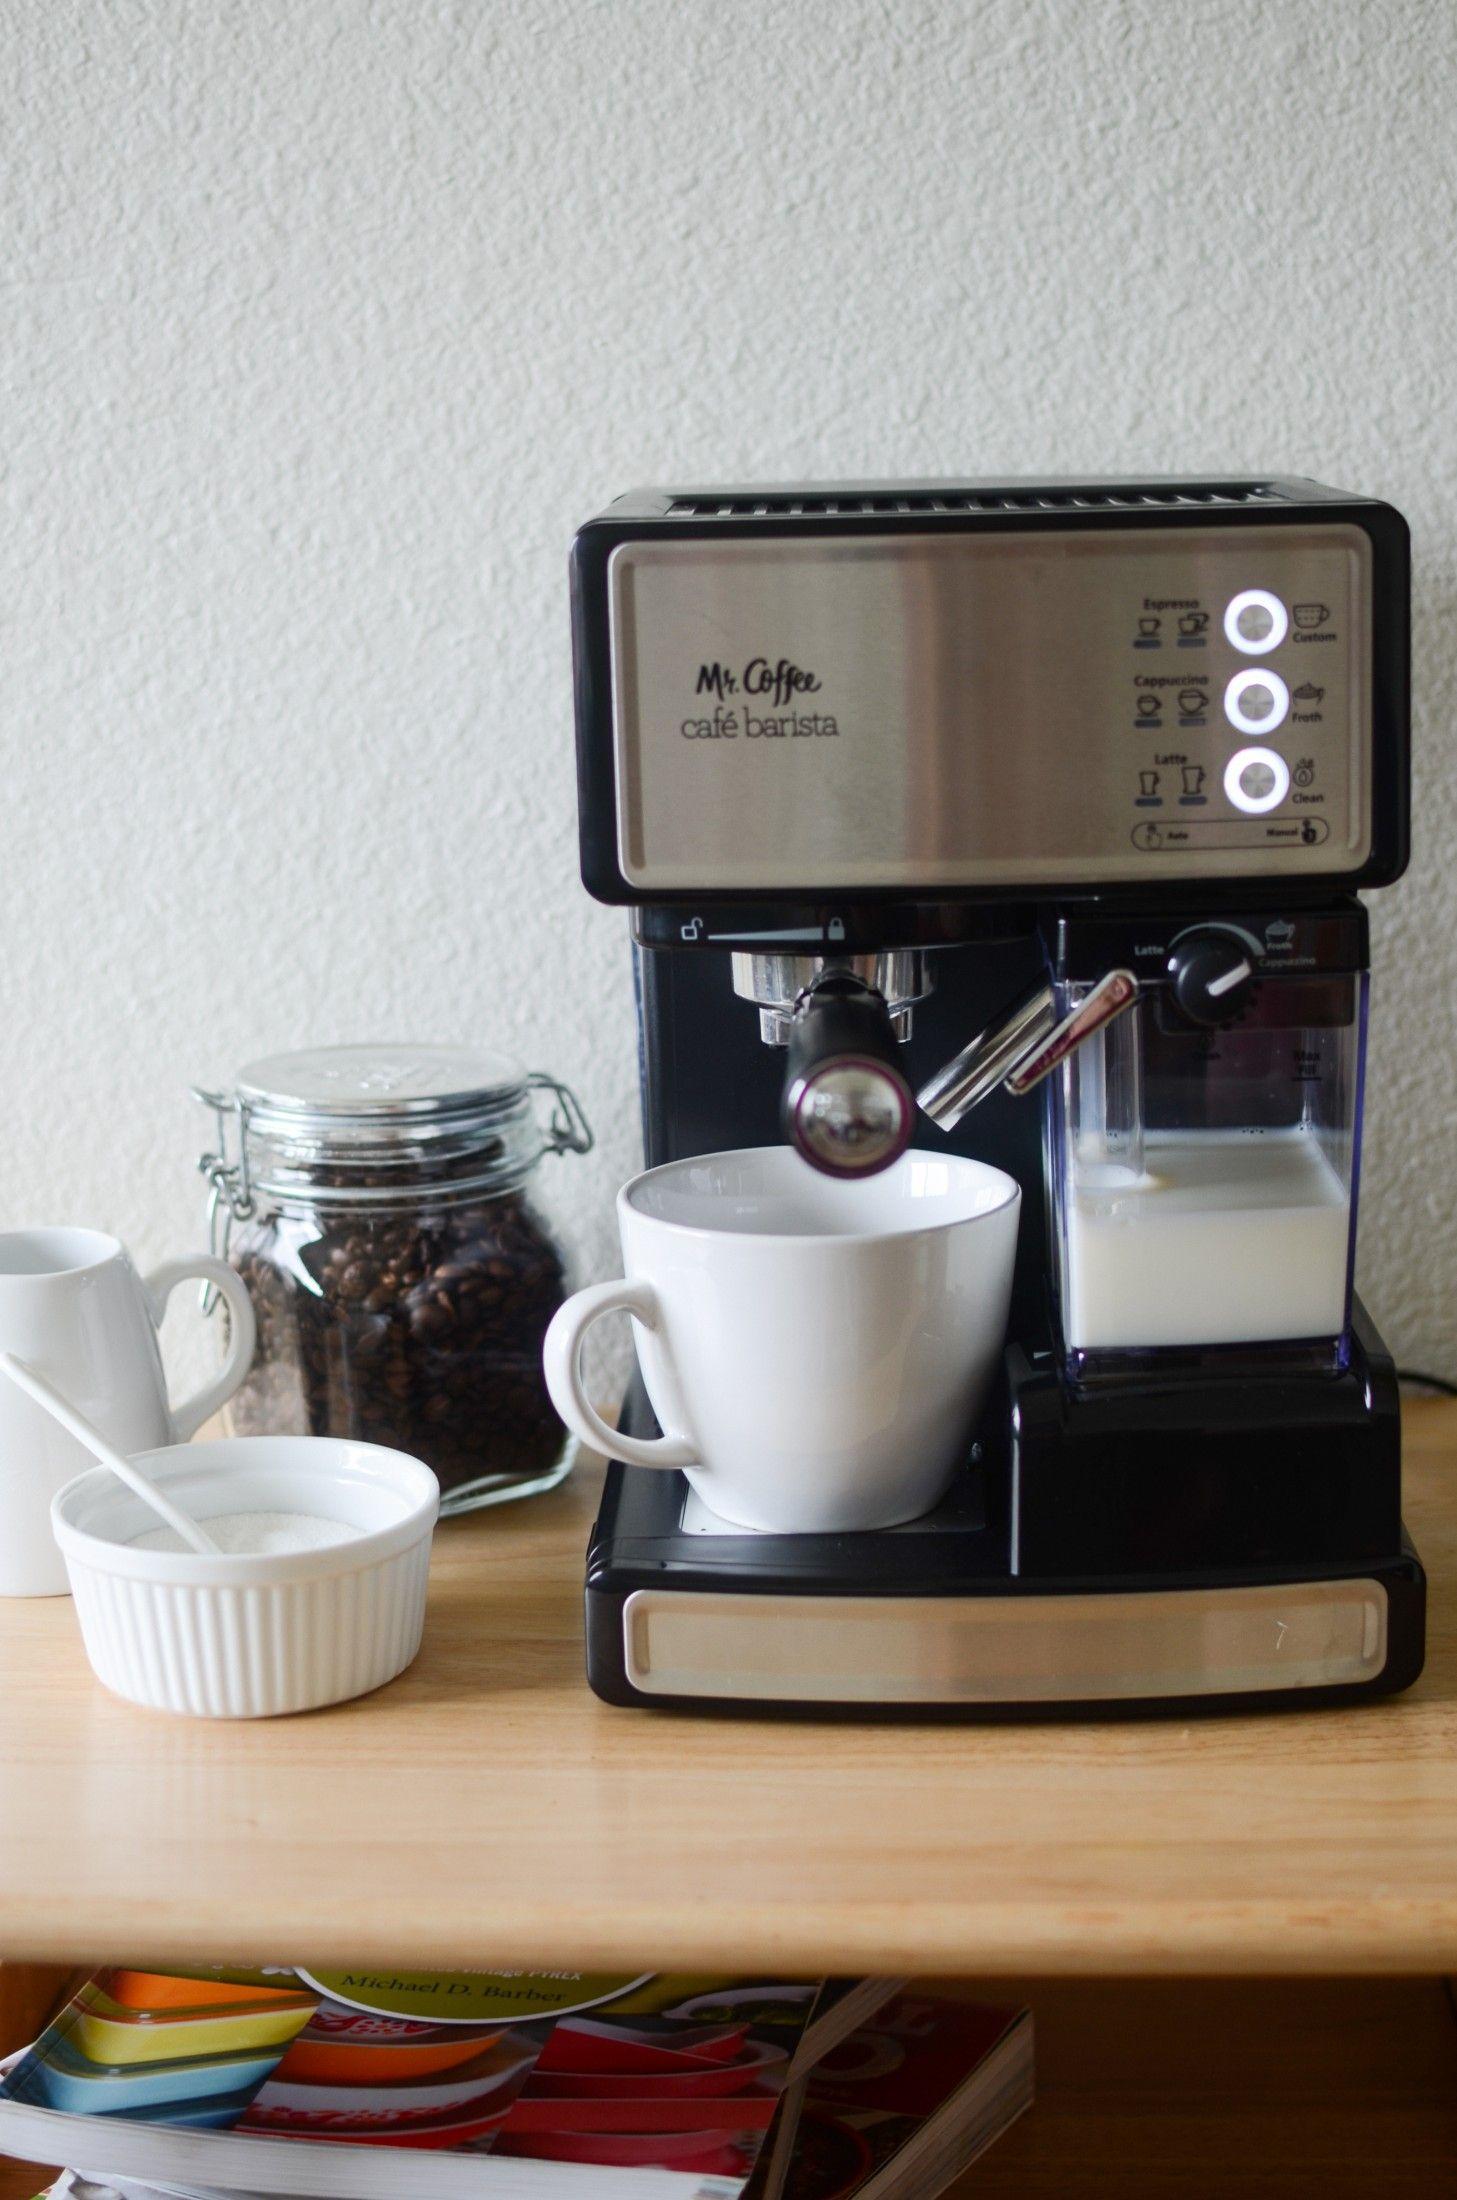 Café Barista Pump Espresso Maker at Cafe